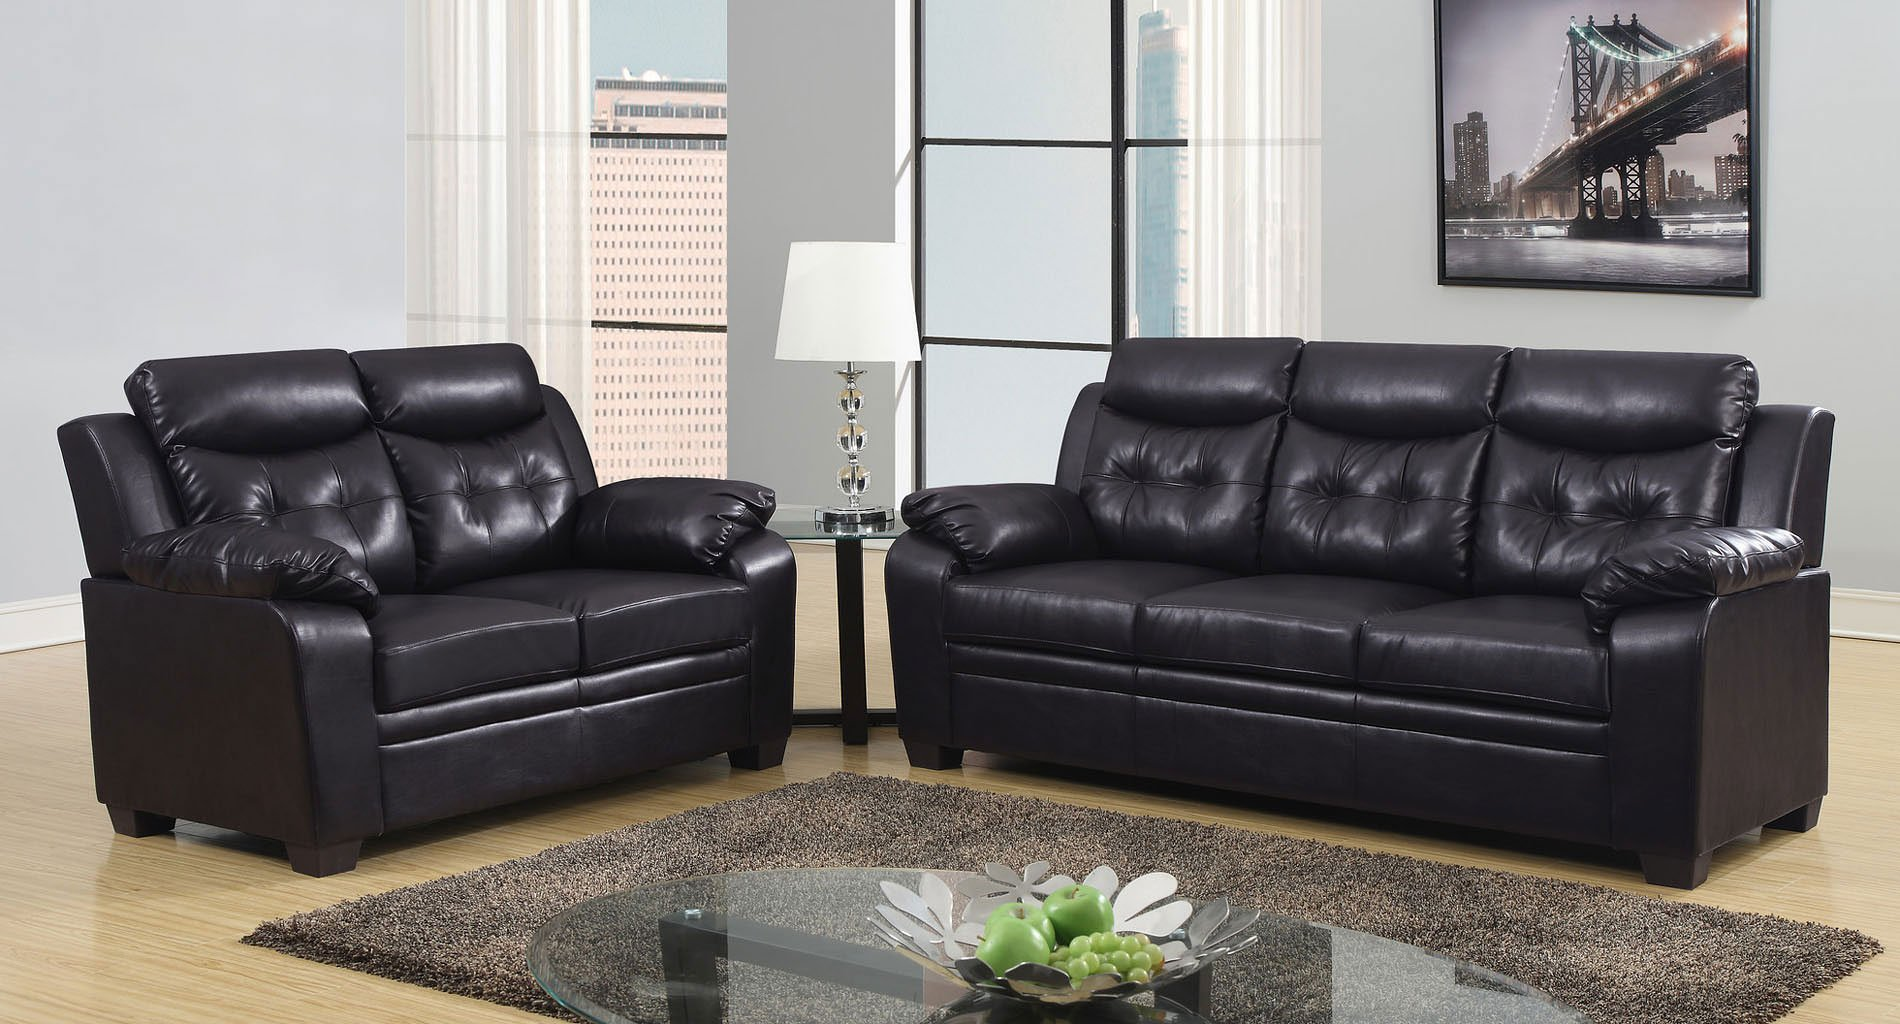 U880016 Living Room Set (Chocolate) Global Furniture ...